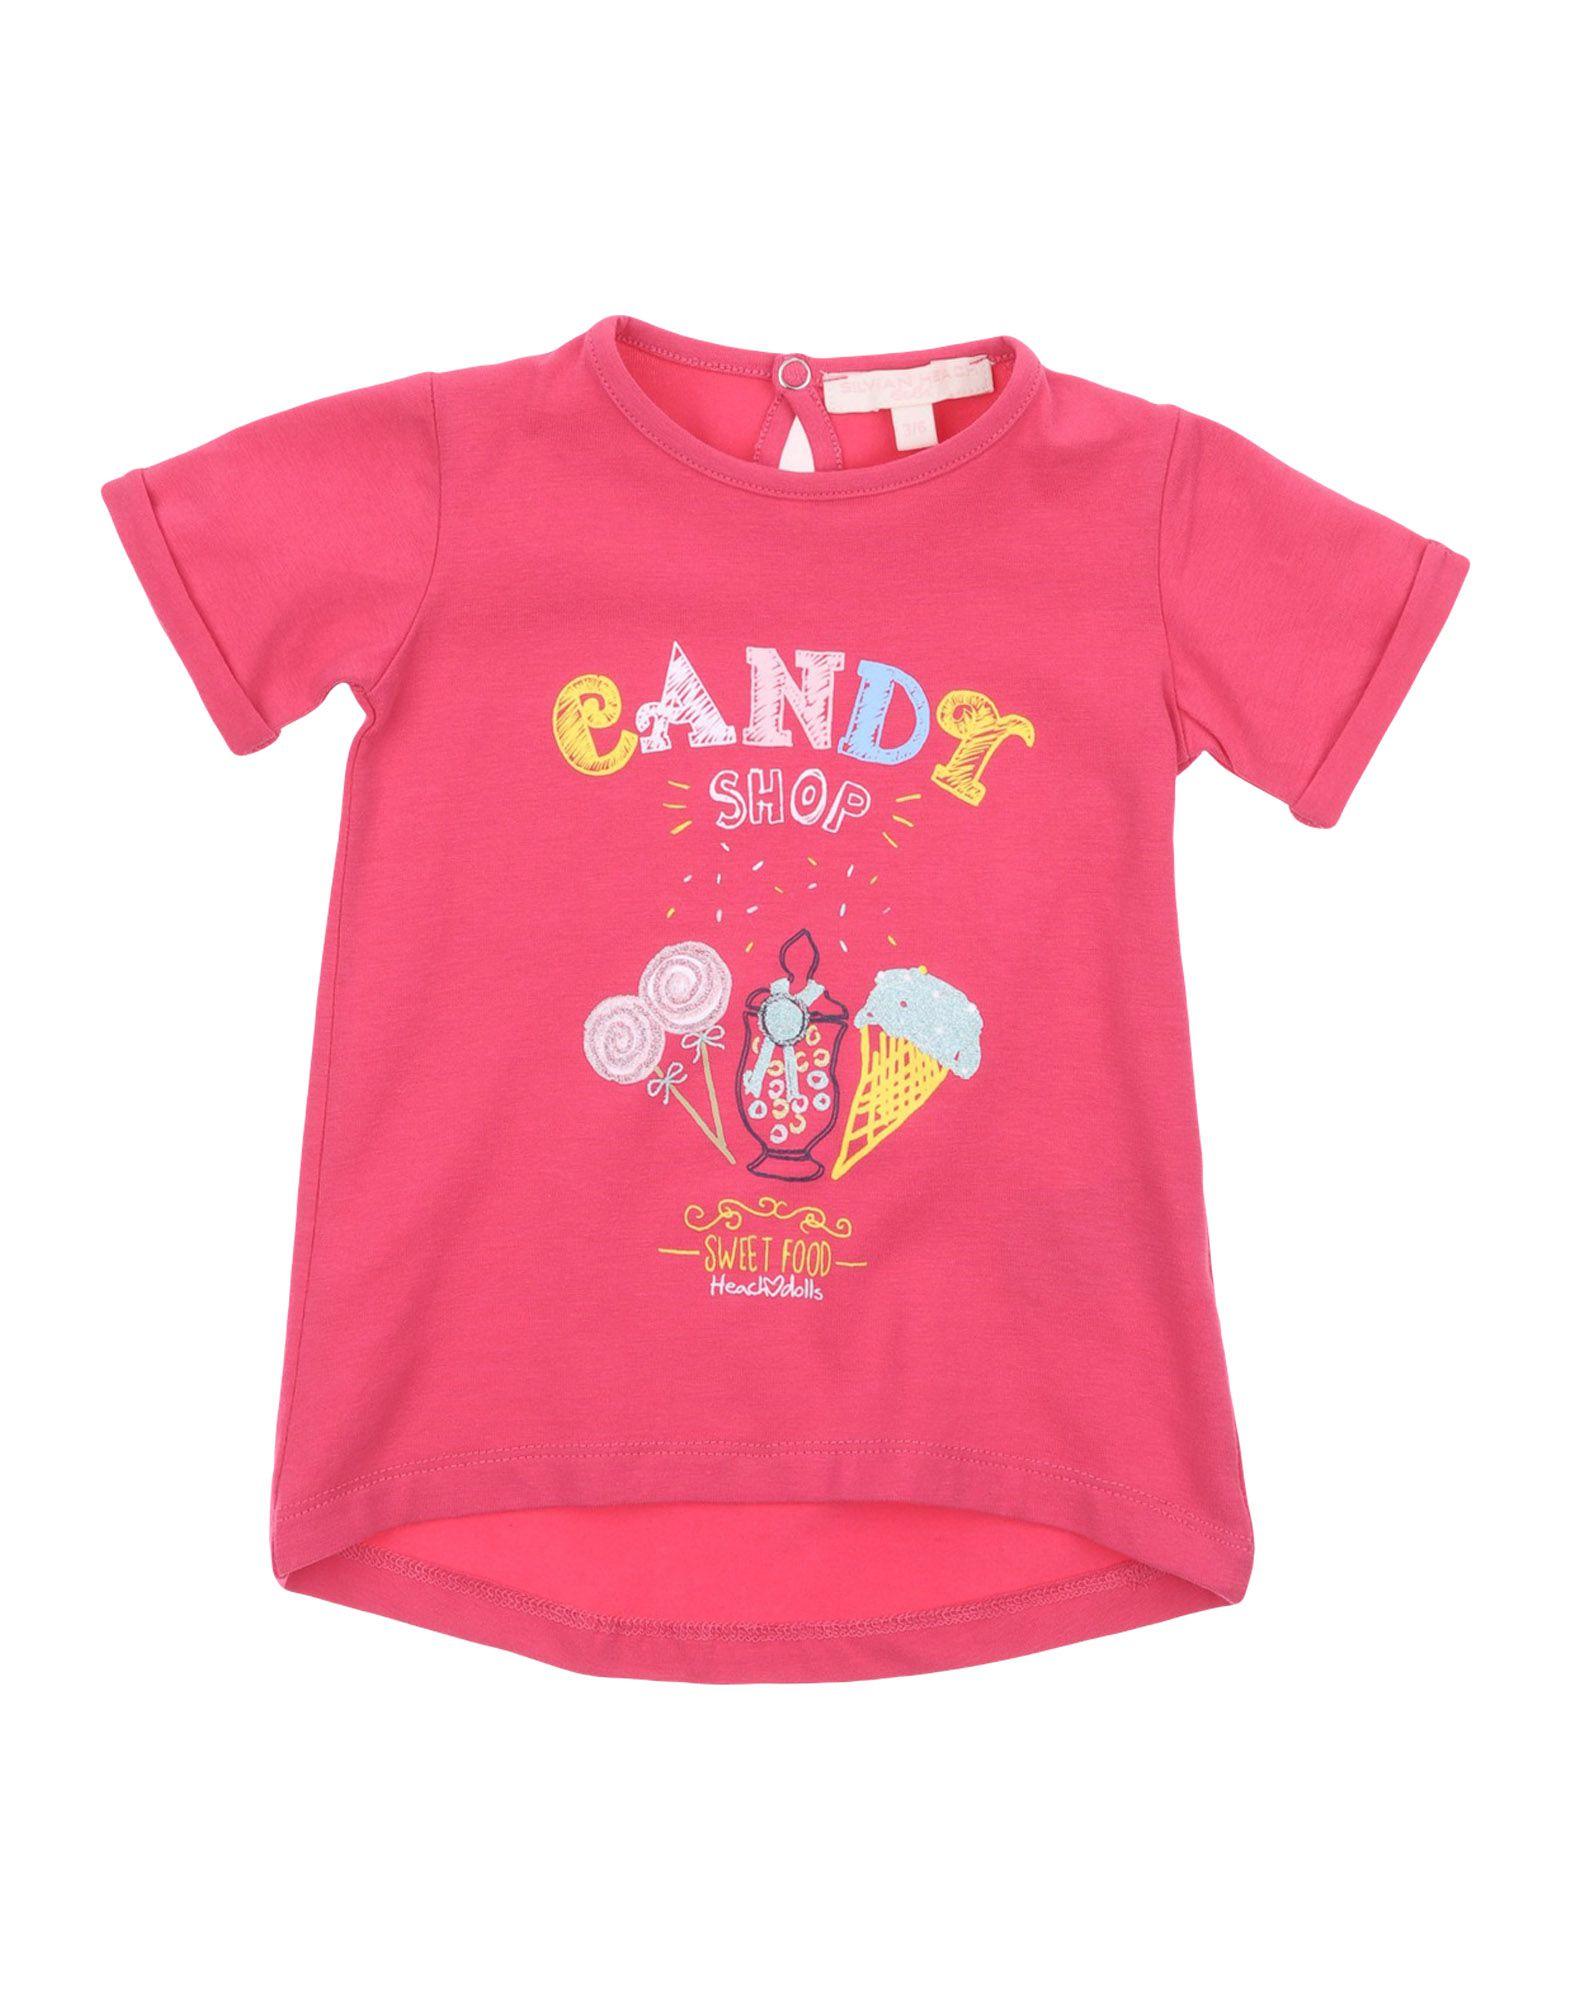 Silvian Heach Kids' T-shirts In Pink